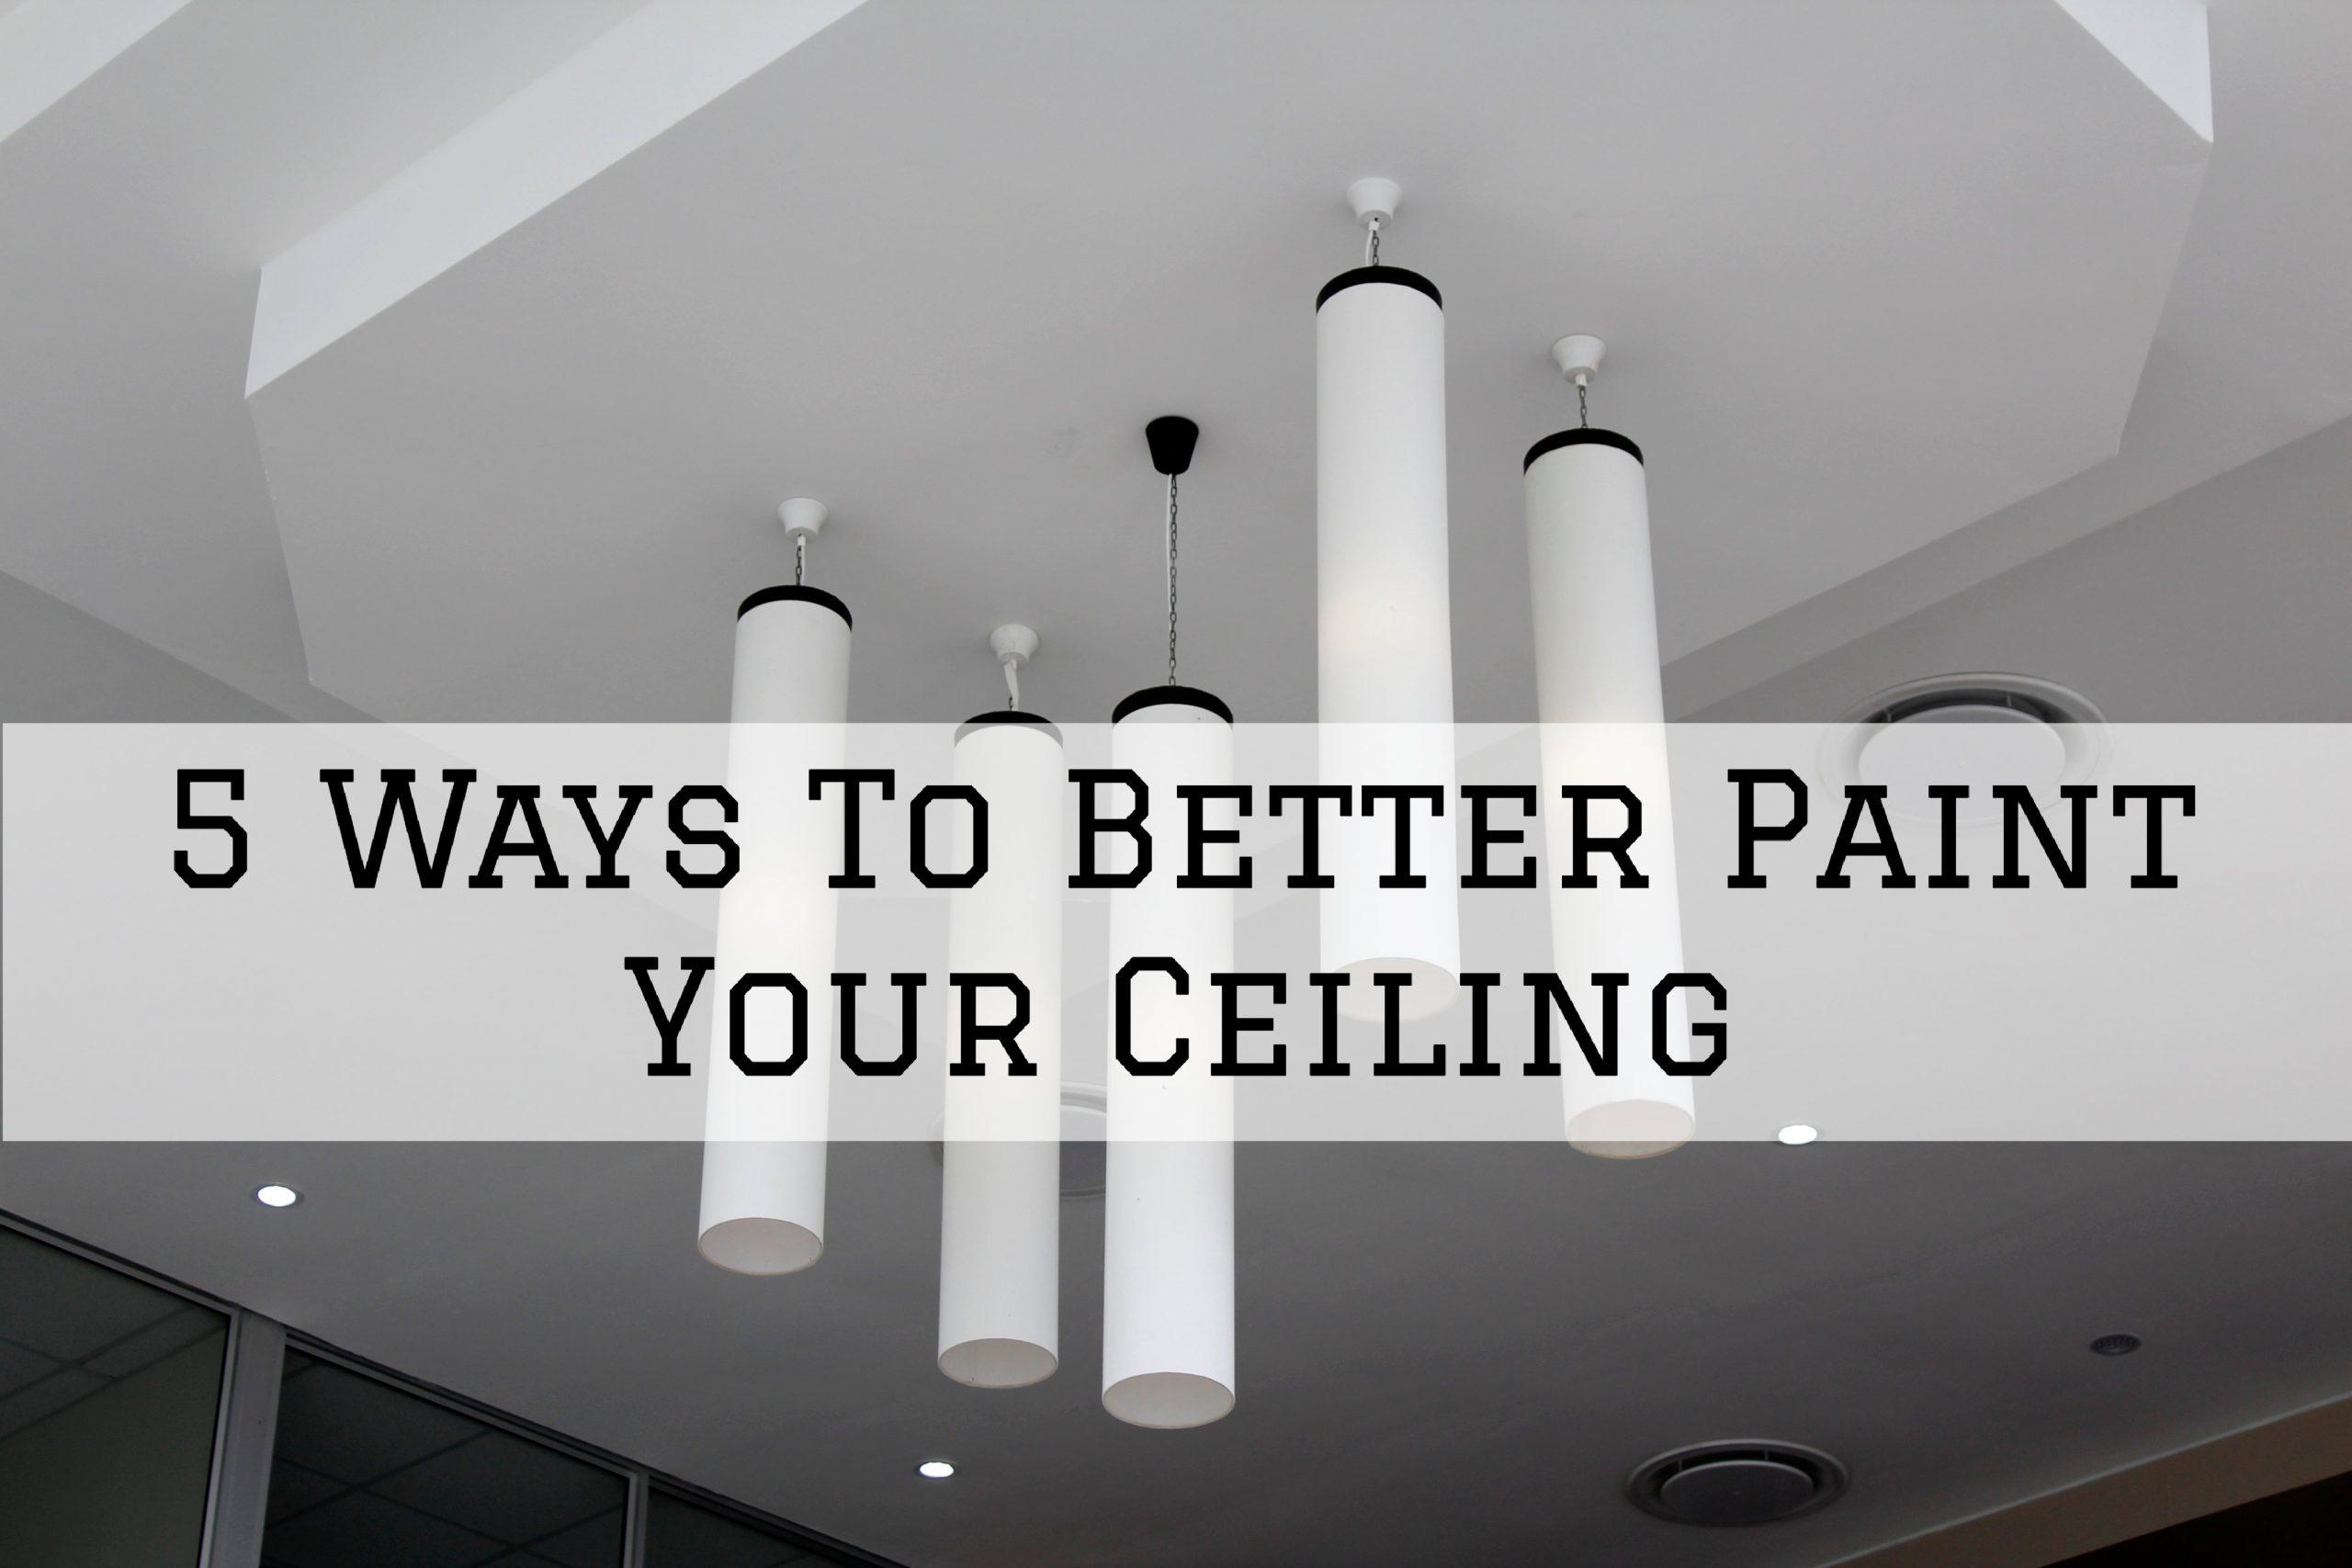 2020-06-07 Prestigious Painting Baton Rouge LA Better Your Ceiling Painting